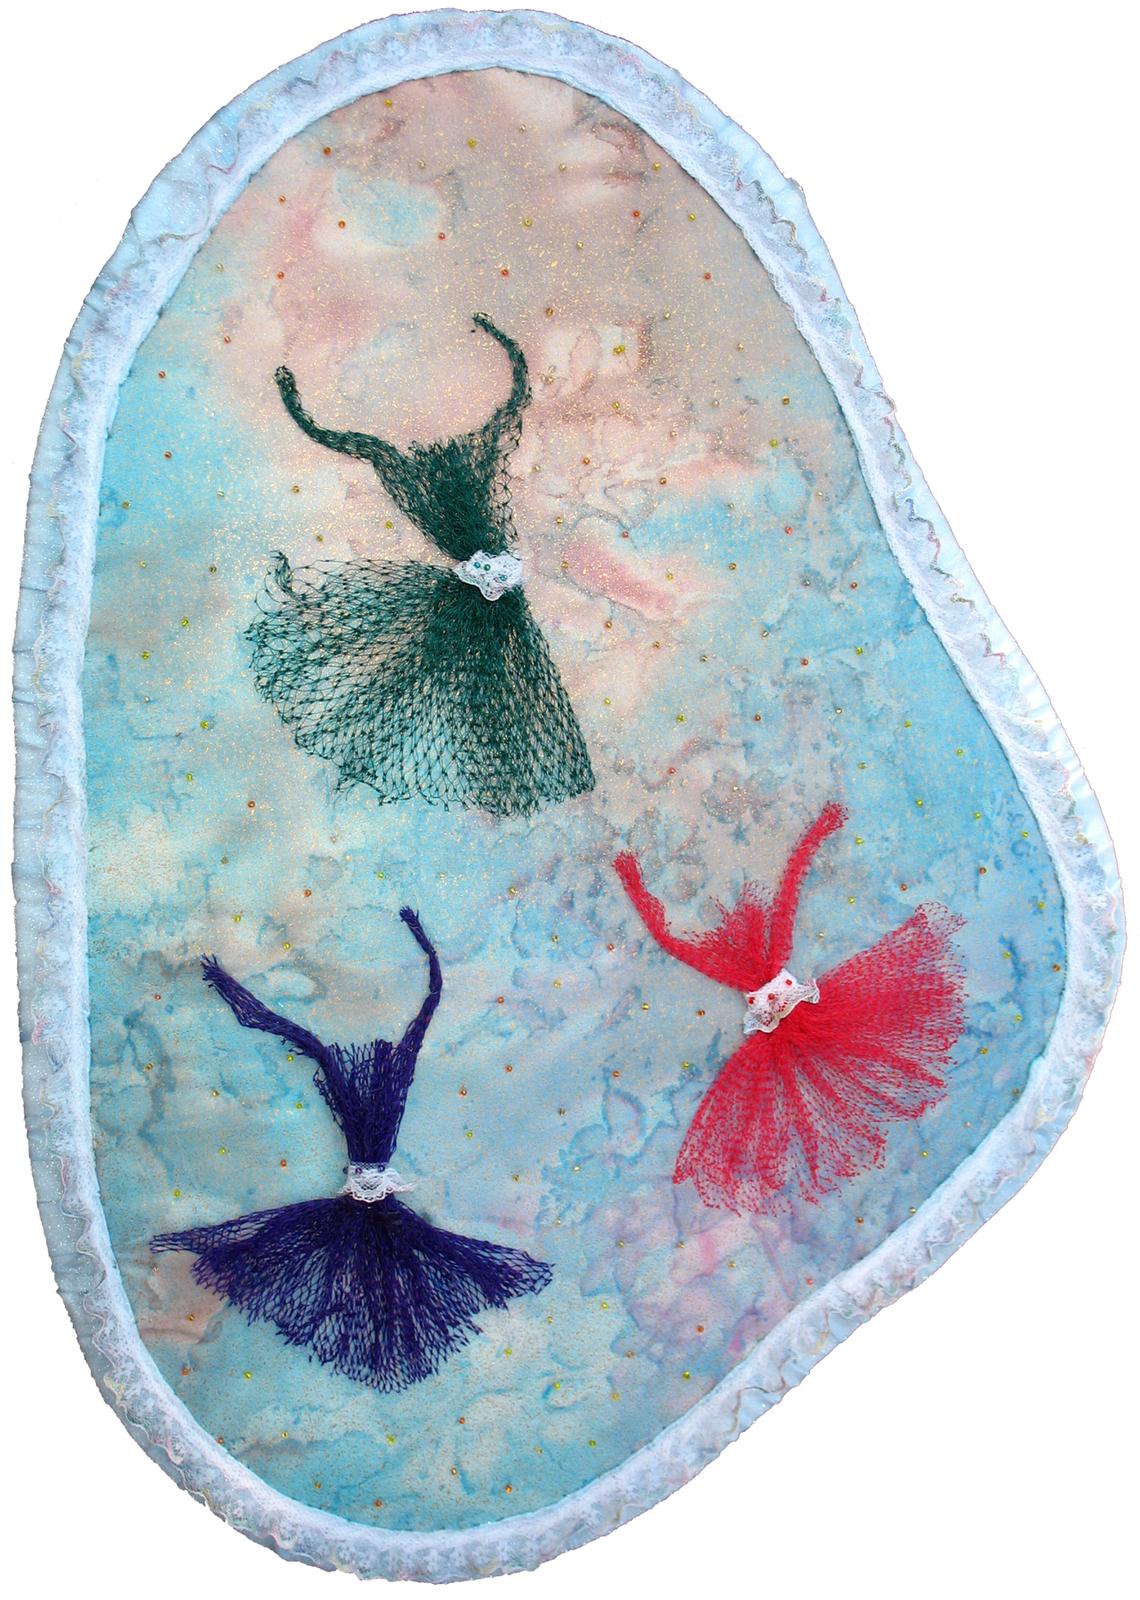 Essence of ballet